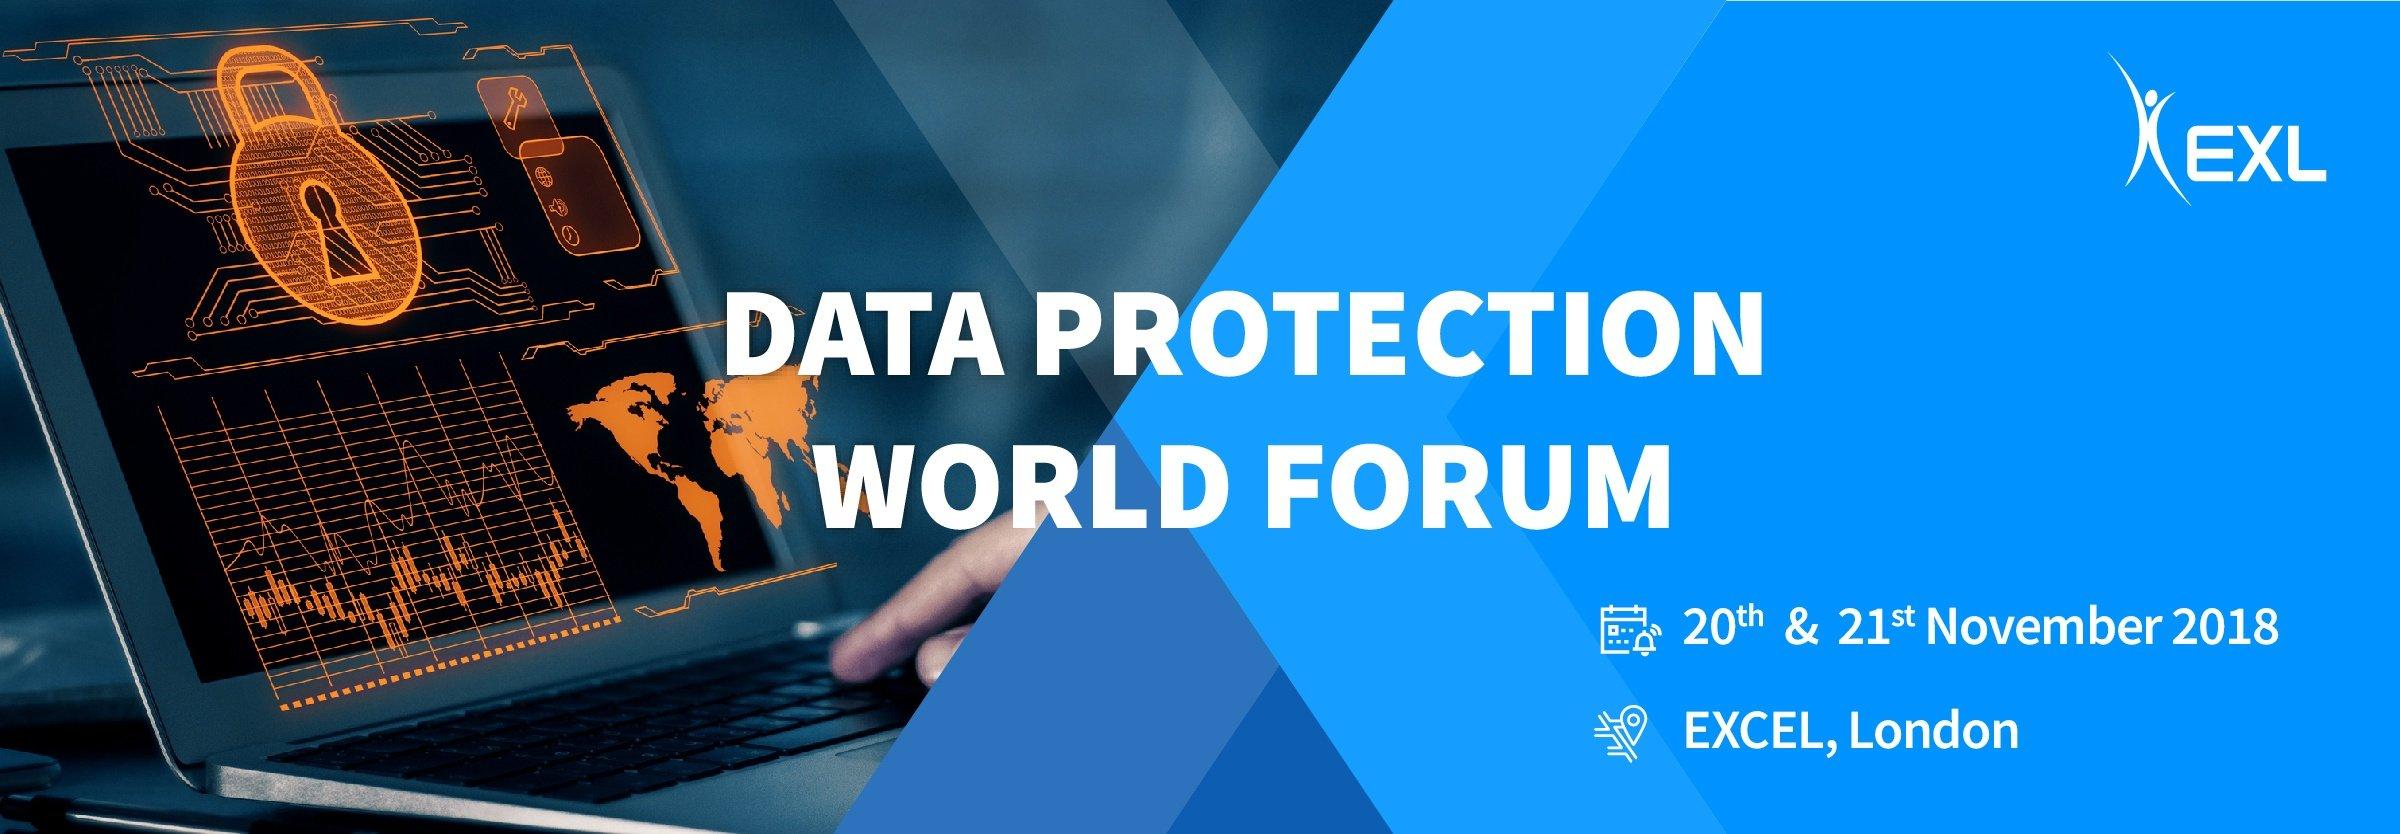 DATA PROTECTION WORLD FORUM-01